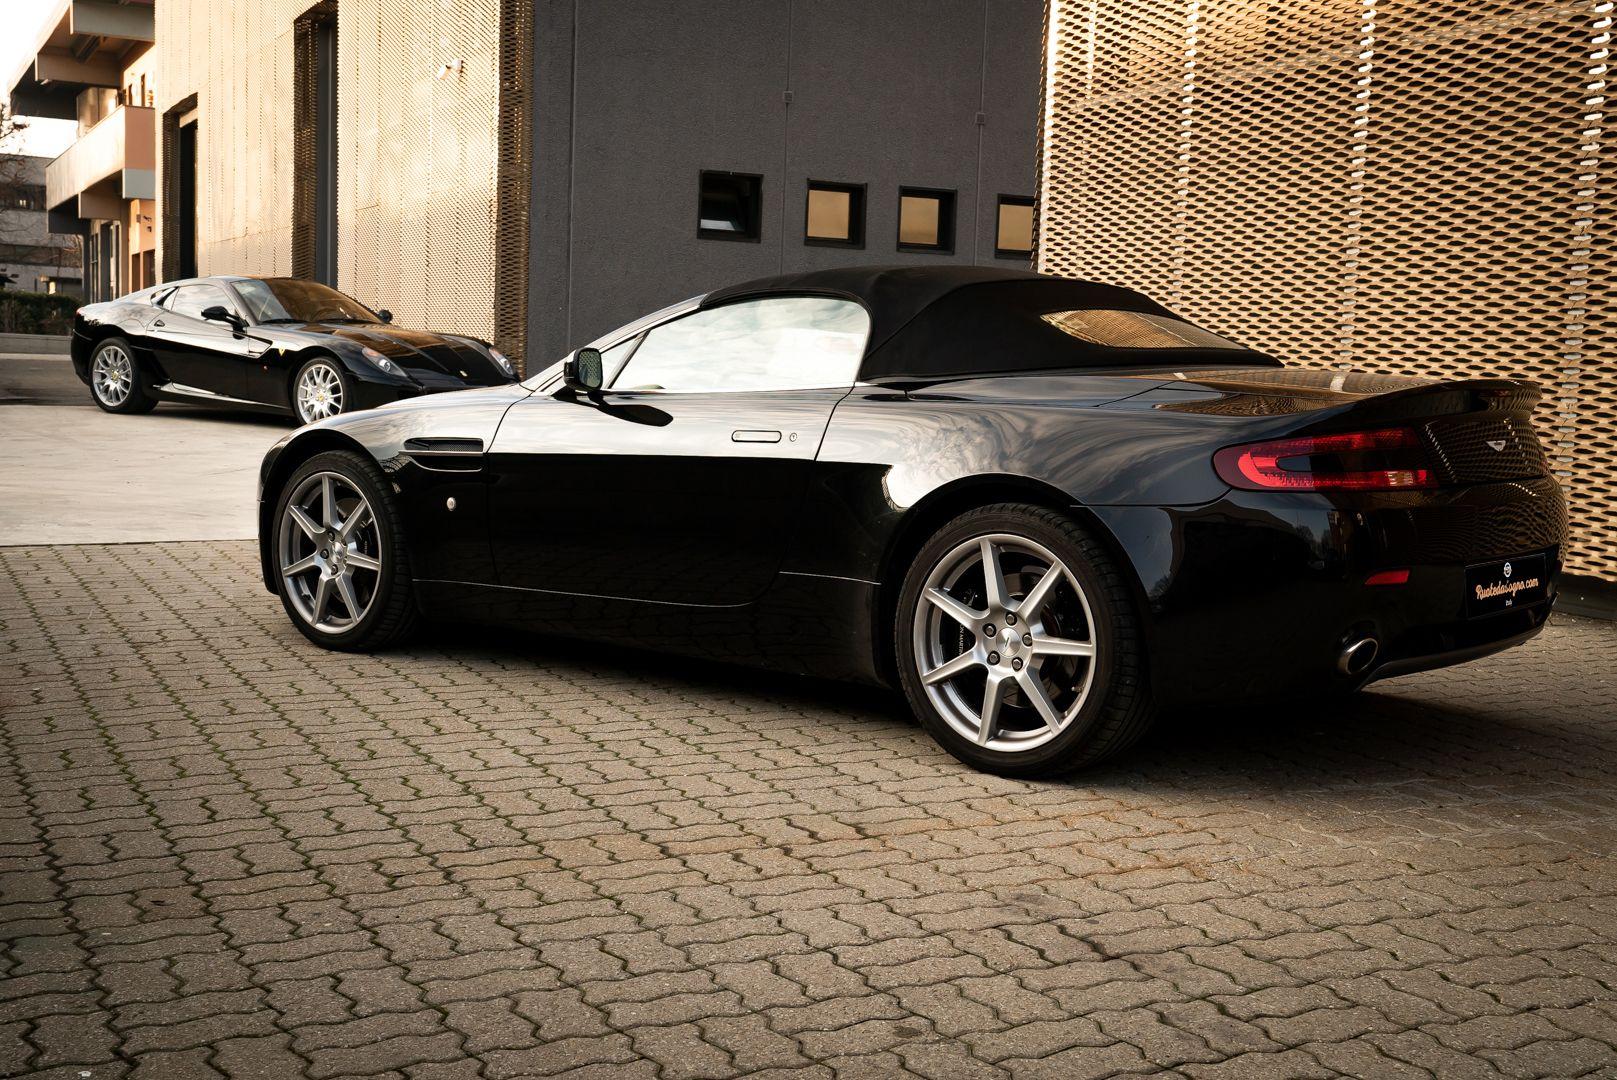 2008 Aston Martin 4.3 V8 Vantage Roadster N400 82809